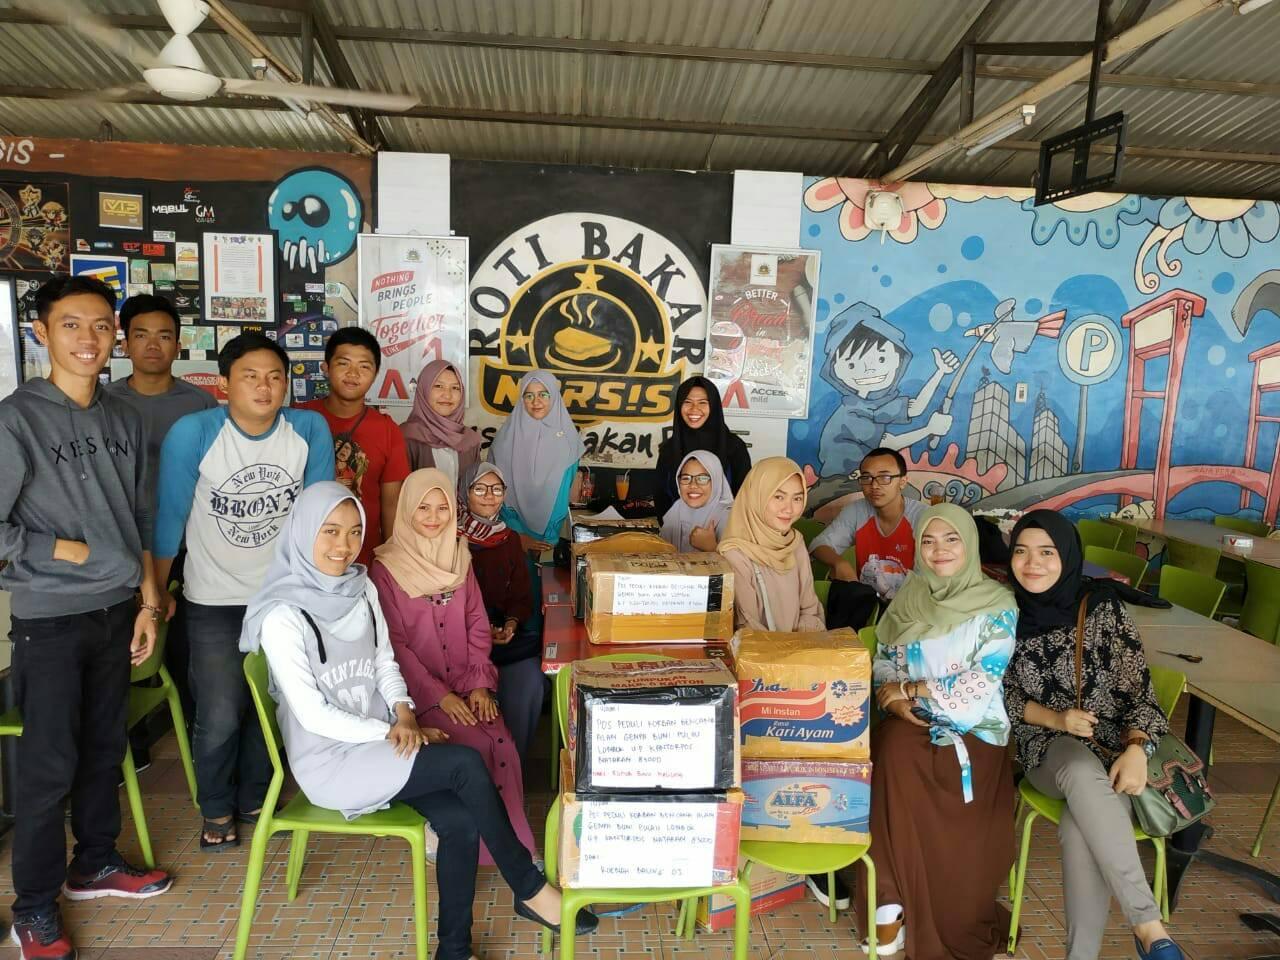 Kirim Buku Bacaan, Ringankan Beban Trauma Anak-anak di Lombok